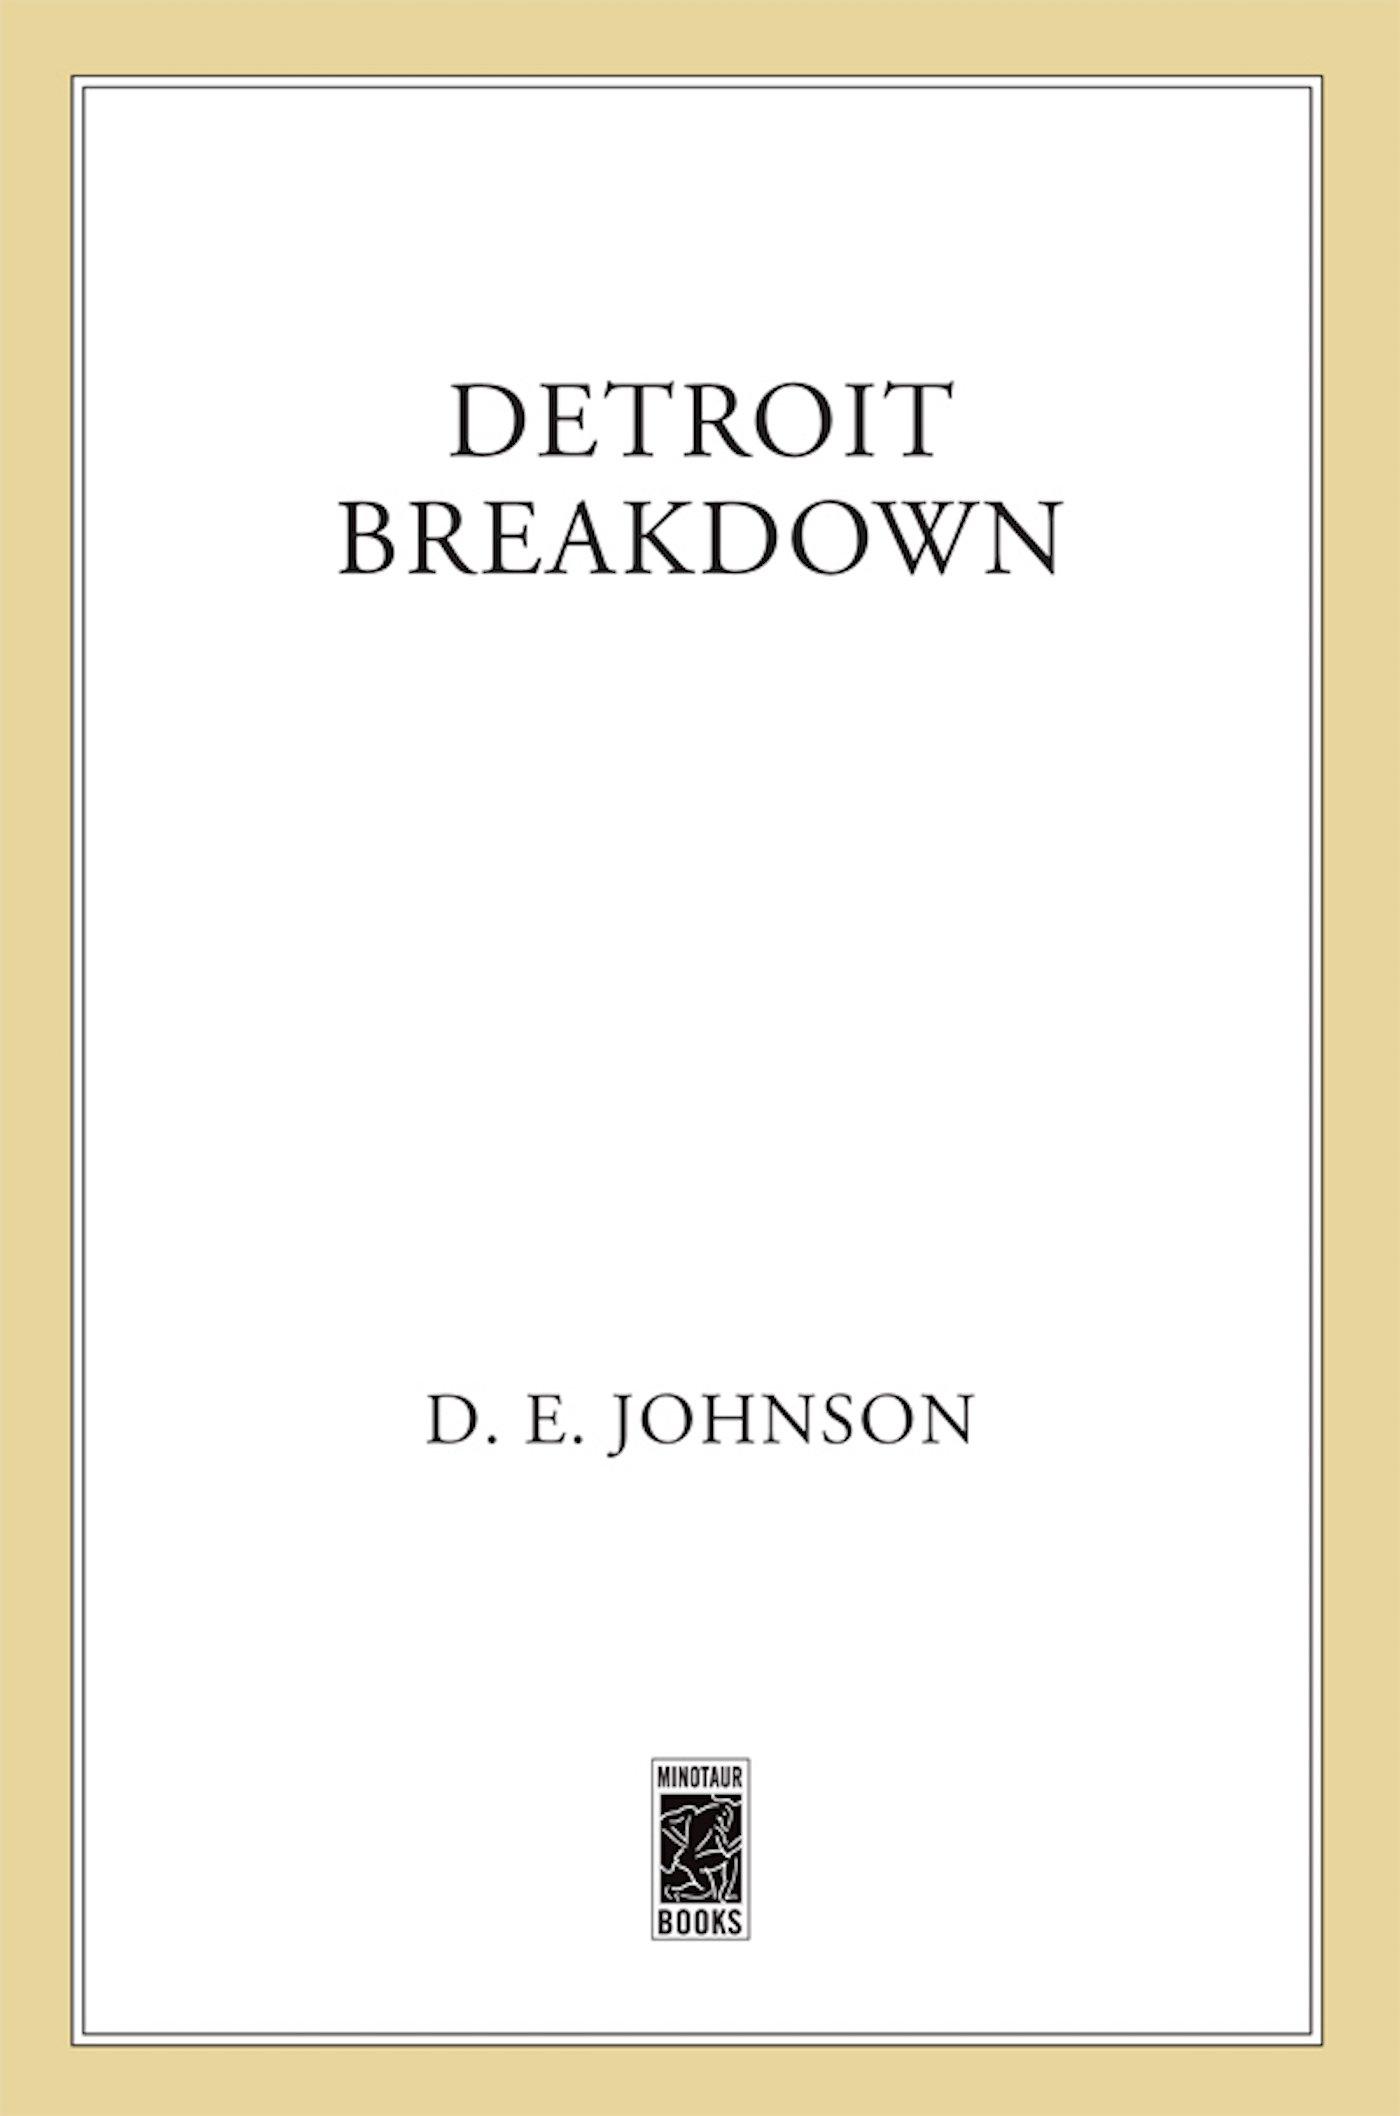 Detroit Breakdown (Detroit Mysteries) pdf